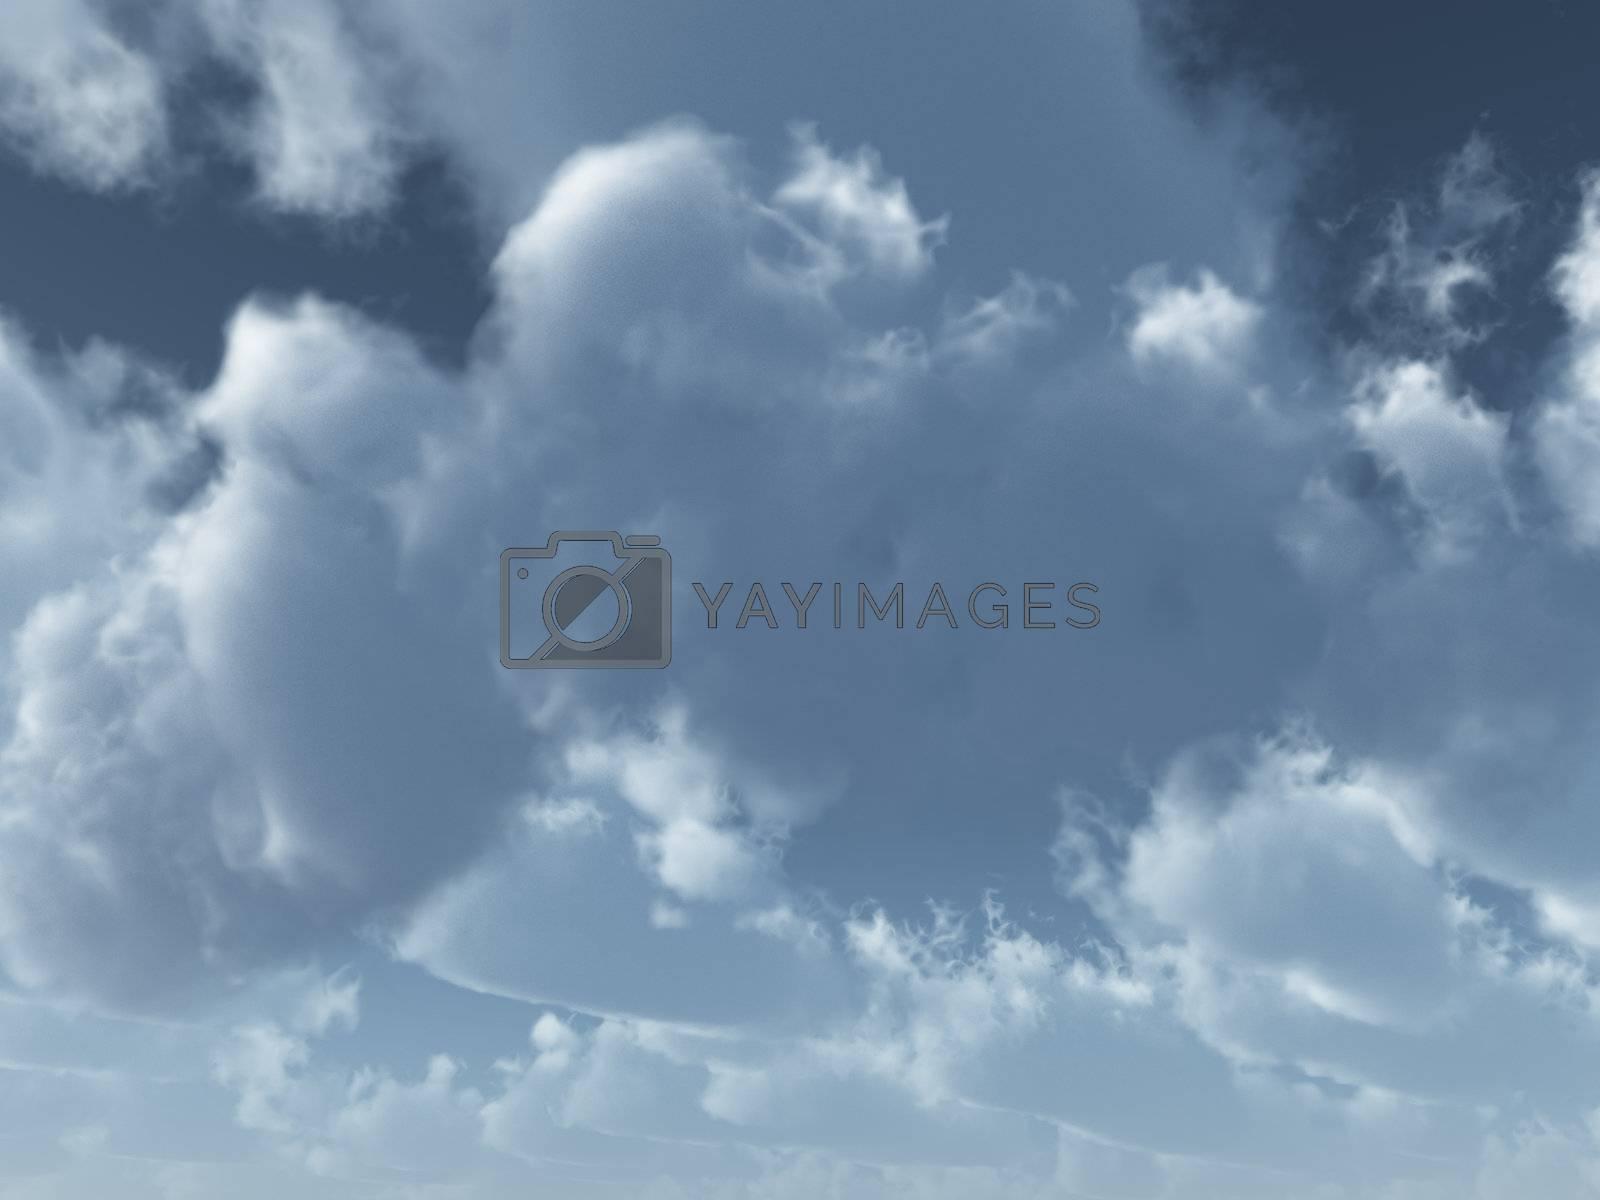 clouds on the blu sky - 3d illustration